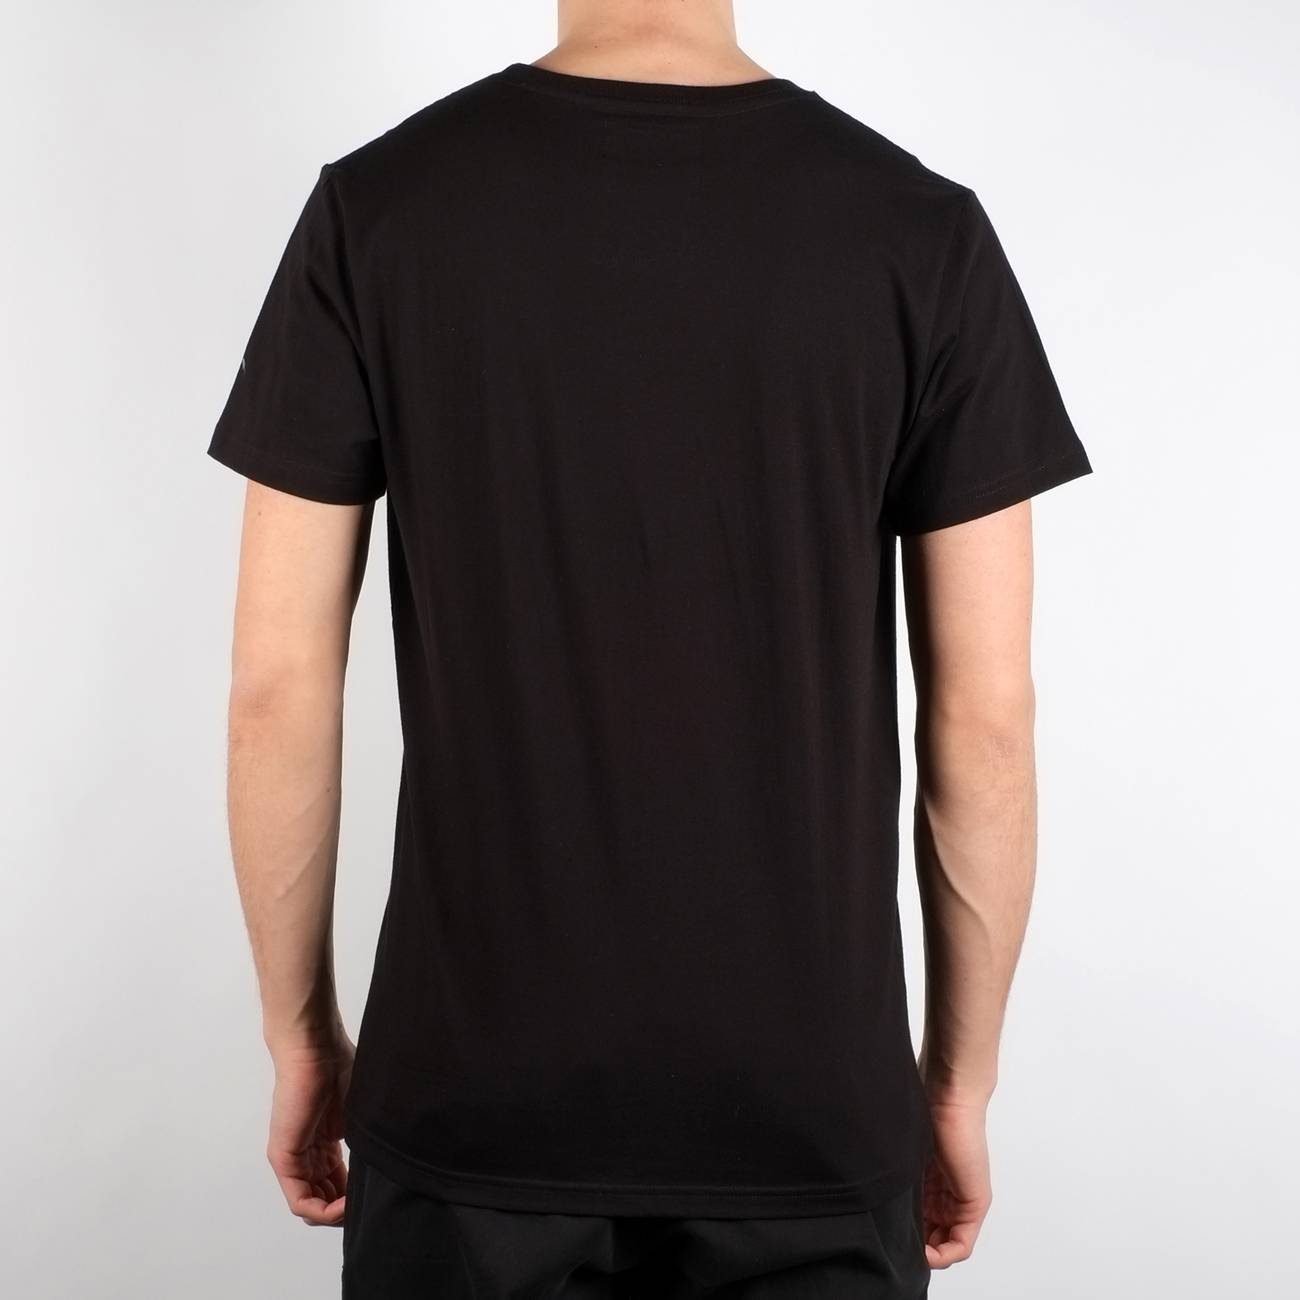 Stockholm T-shirt Internet Lied To Me